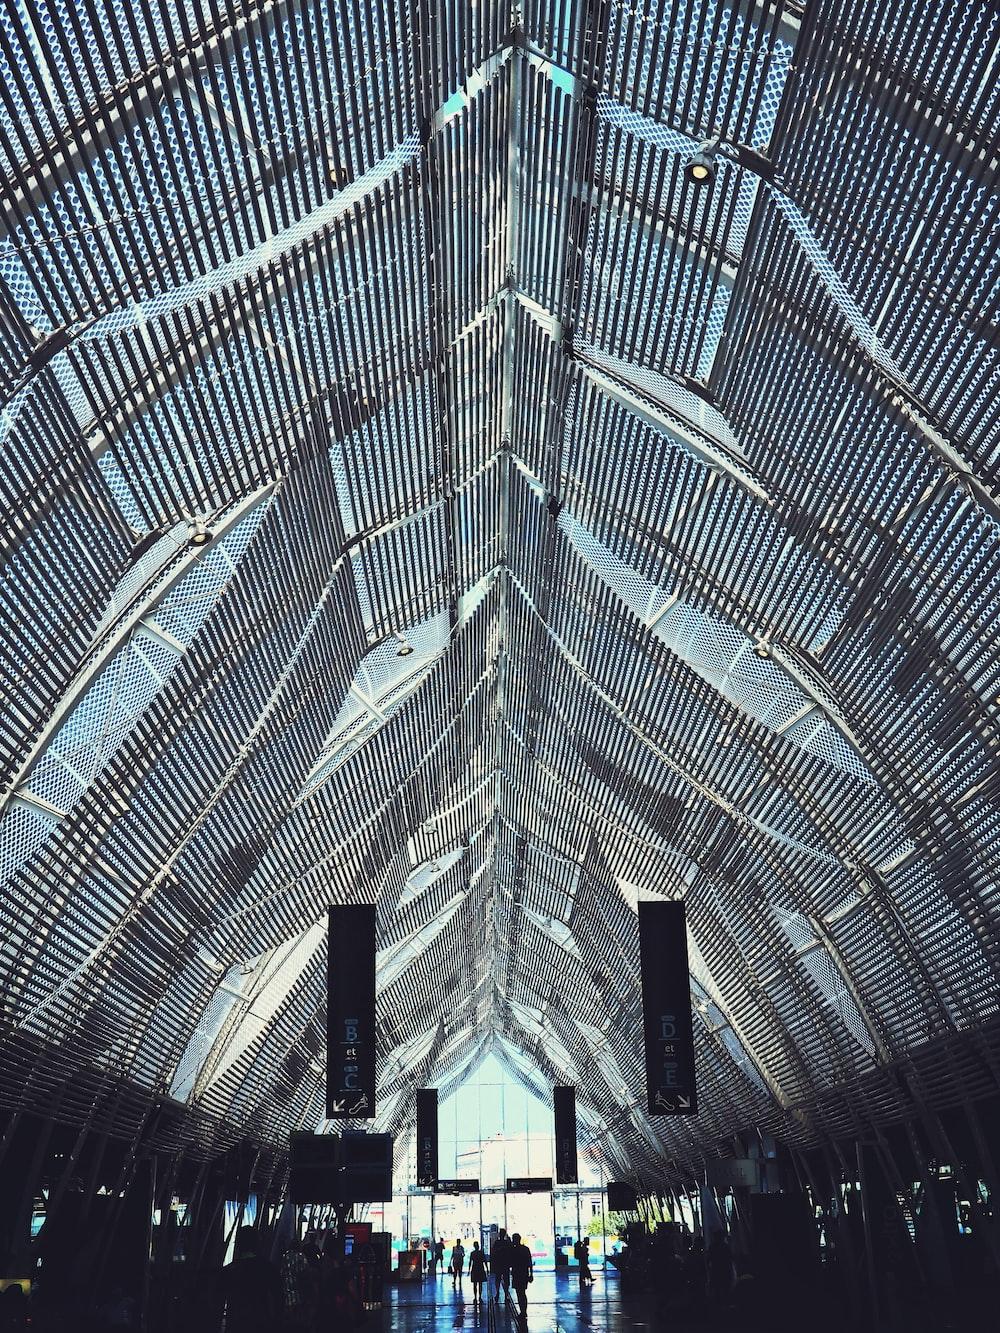 gray metal frame on building